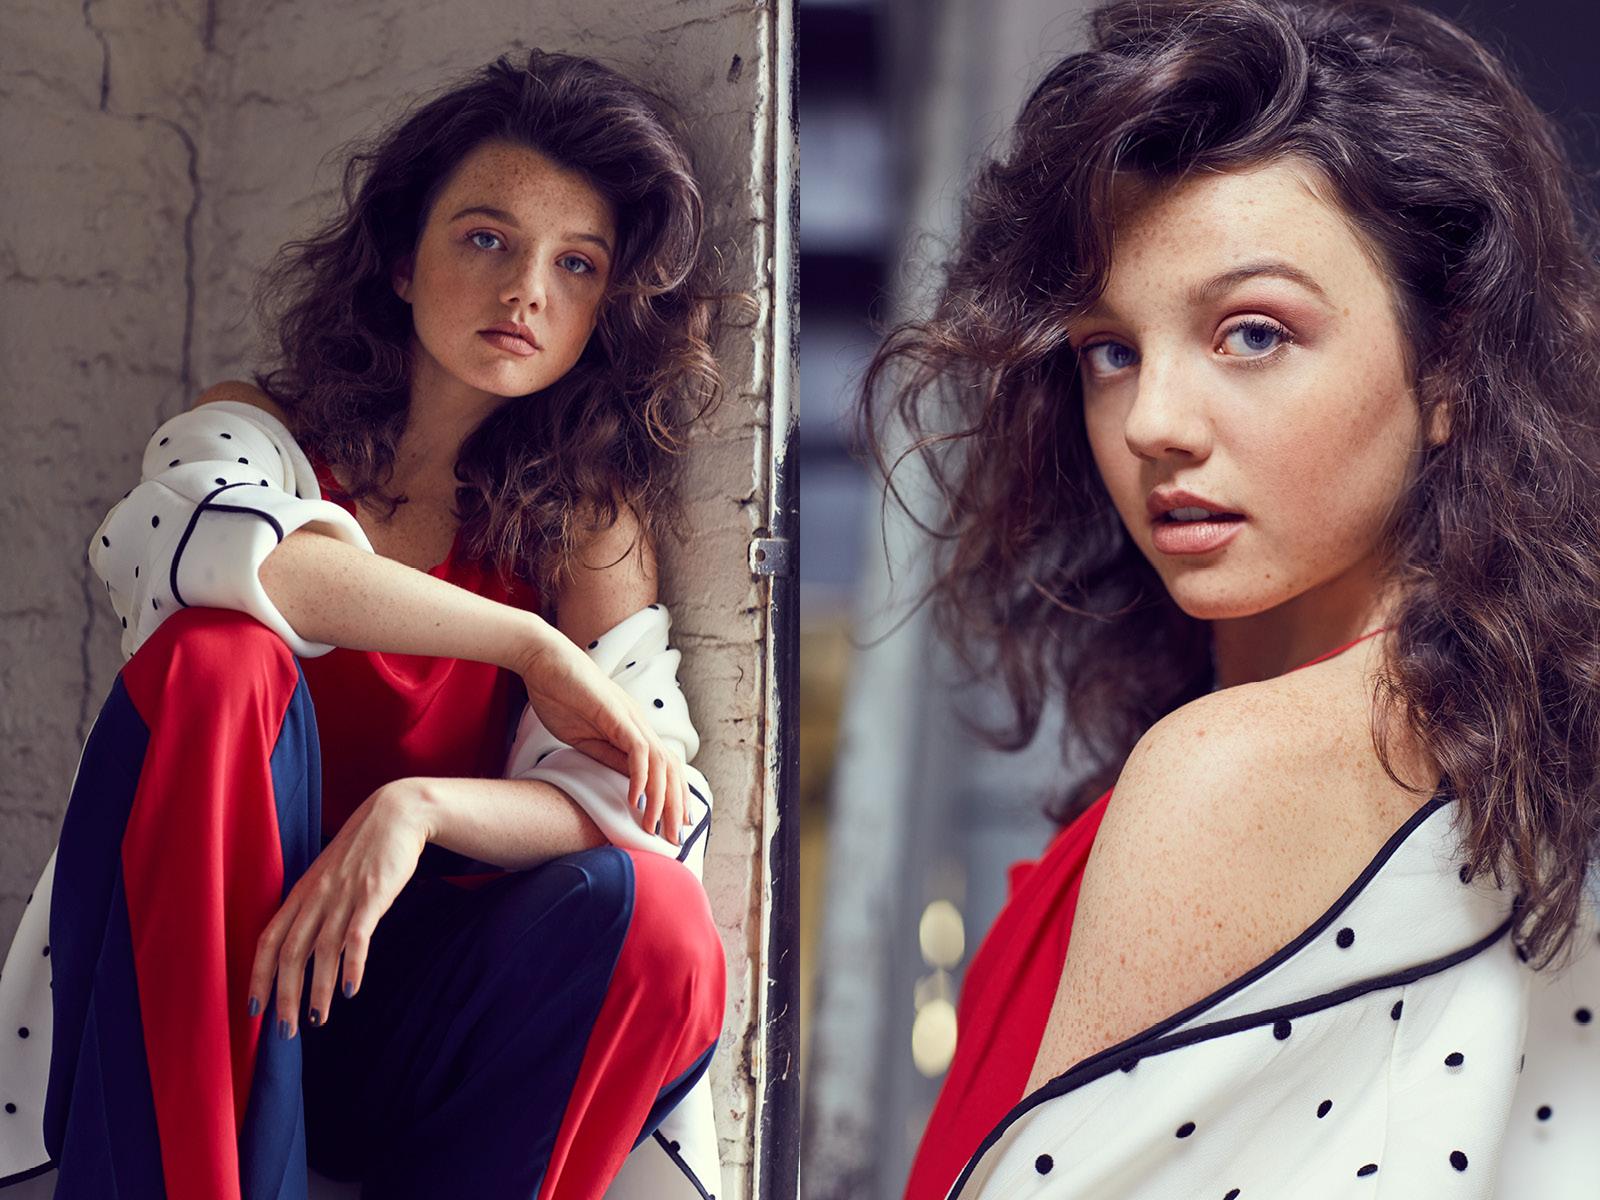 jacket Monzlapur / pants and top Elena Rudenko